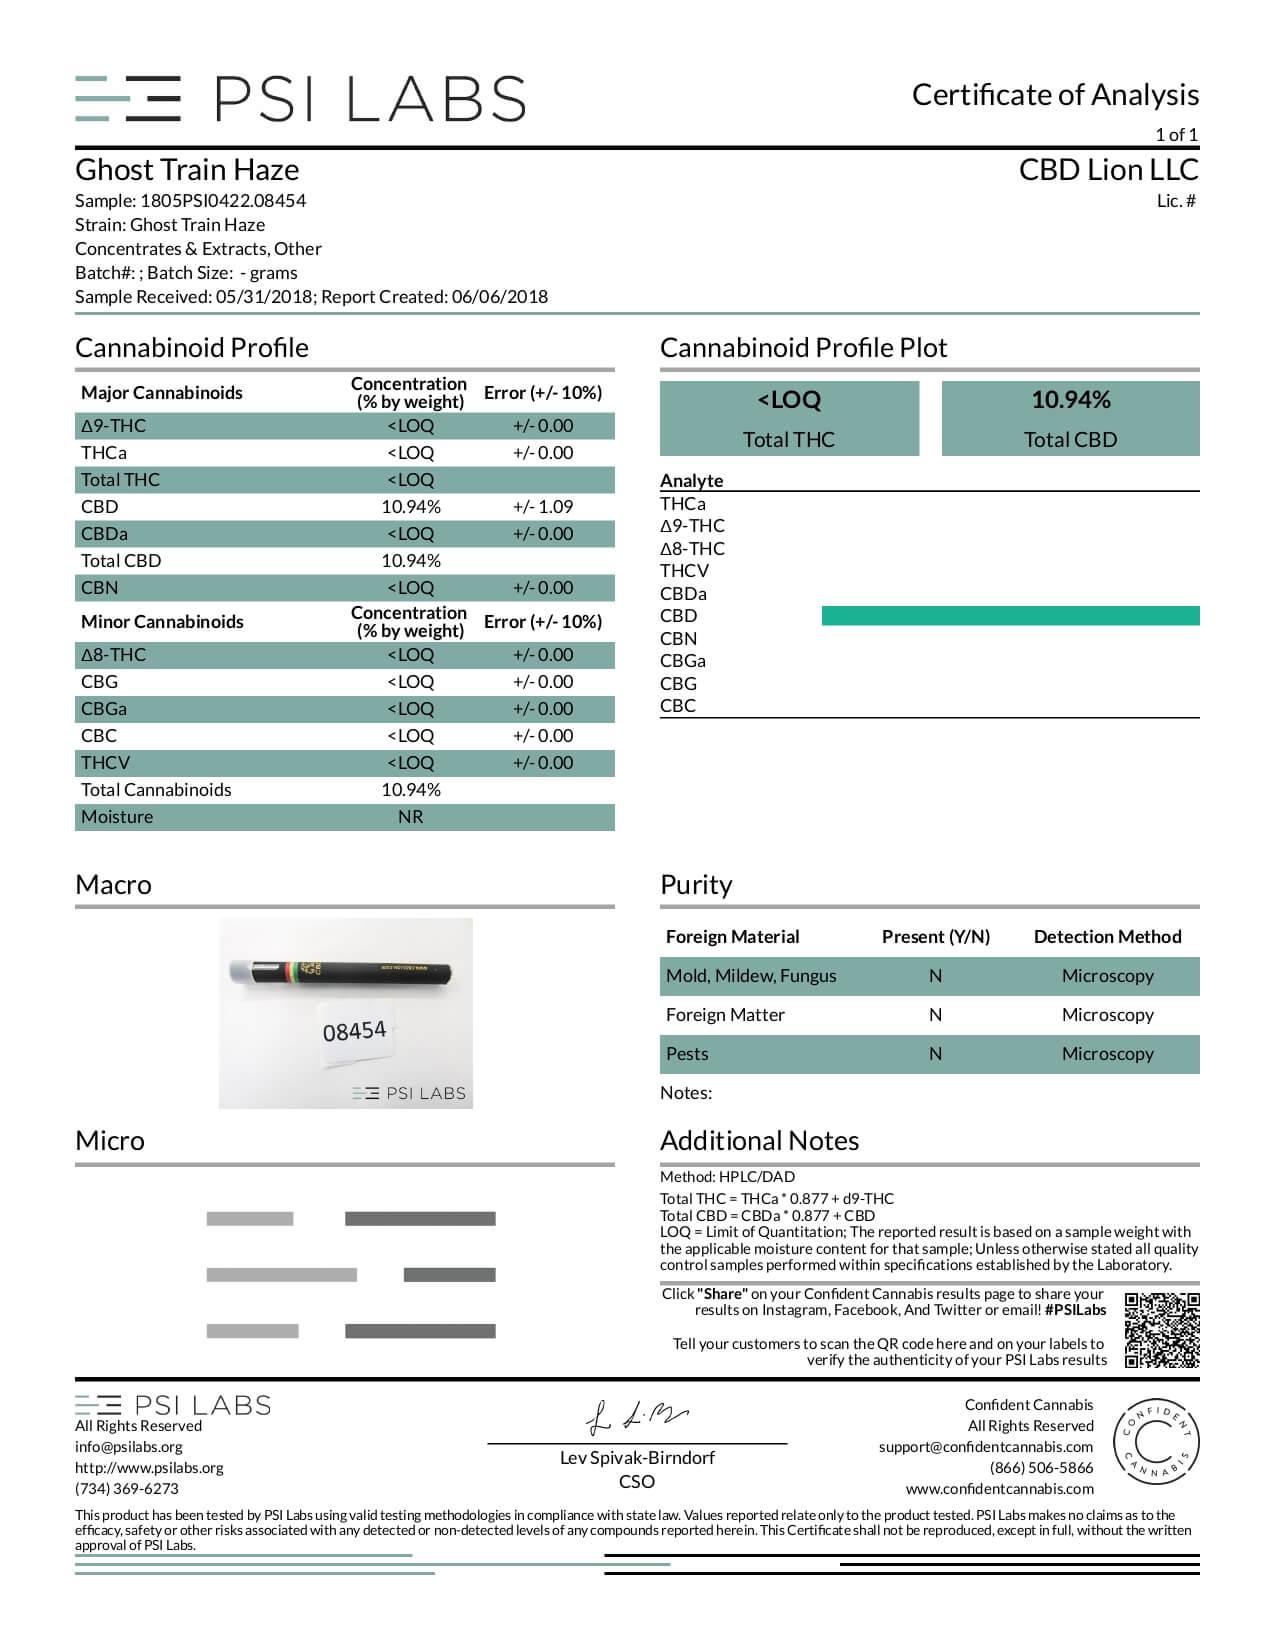 CBD Lion CBD Disposable Vape Pen Ghost Train Haze Lab Report